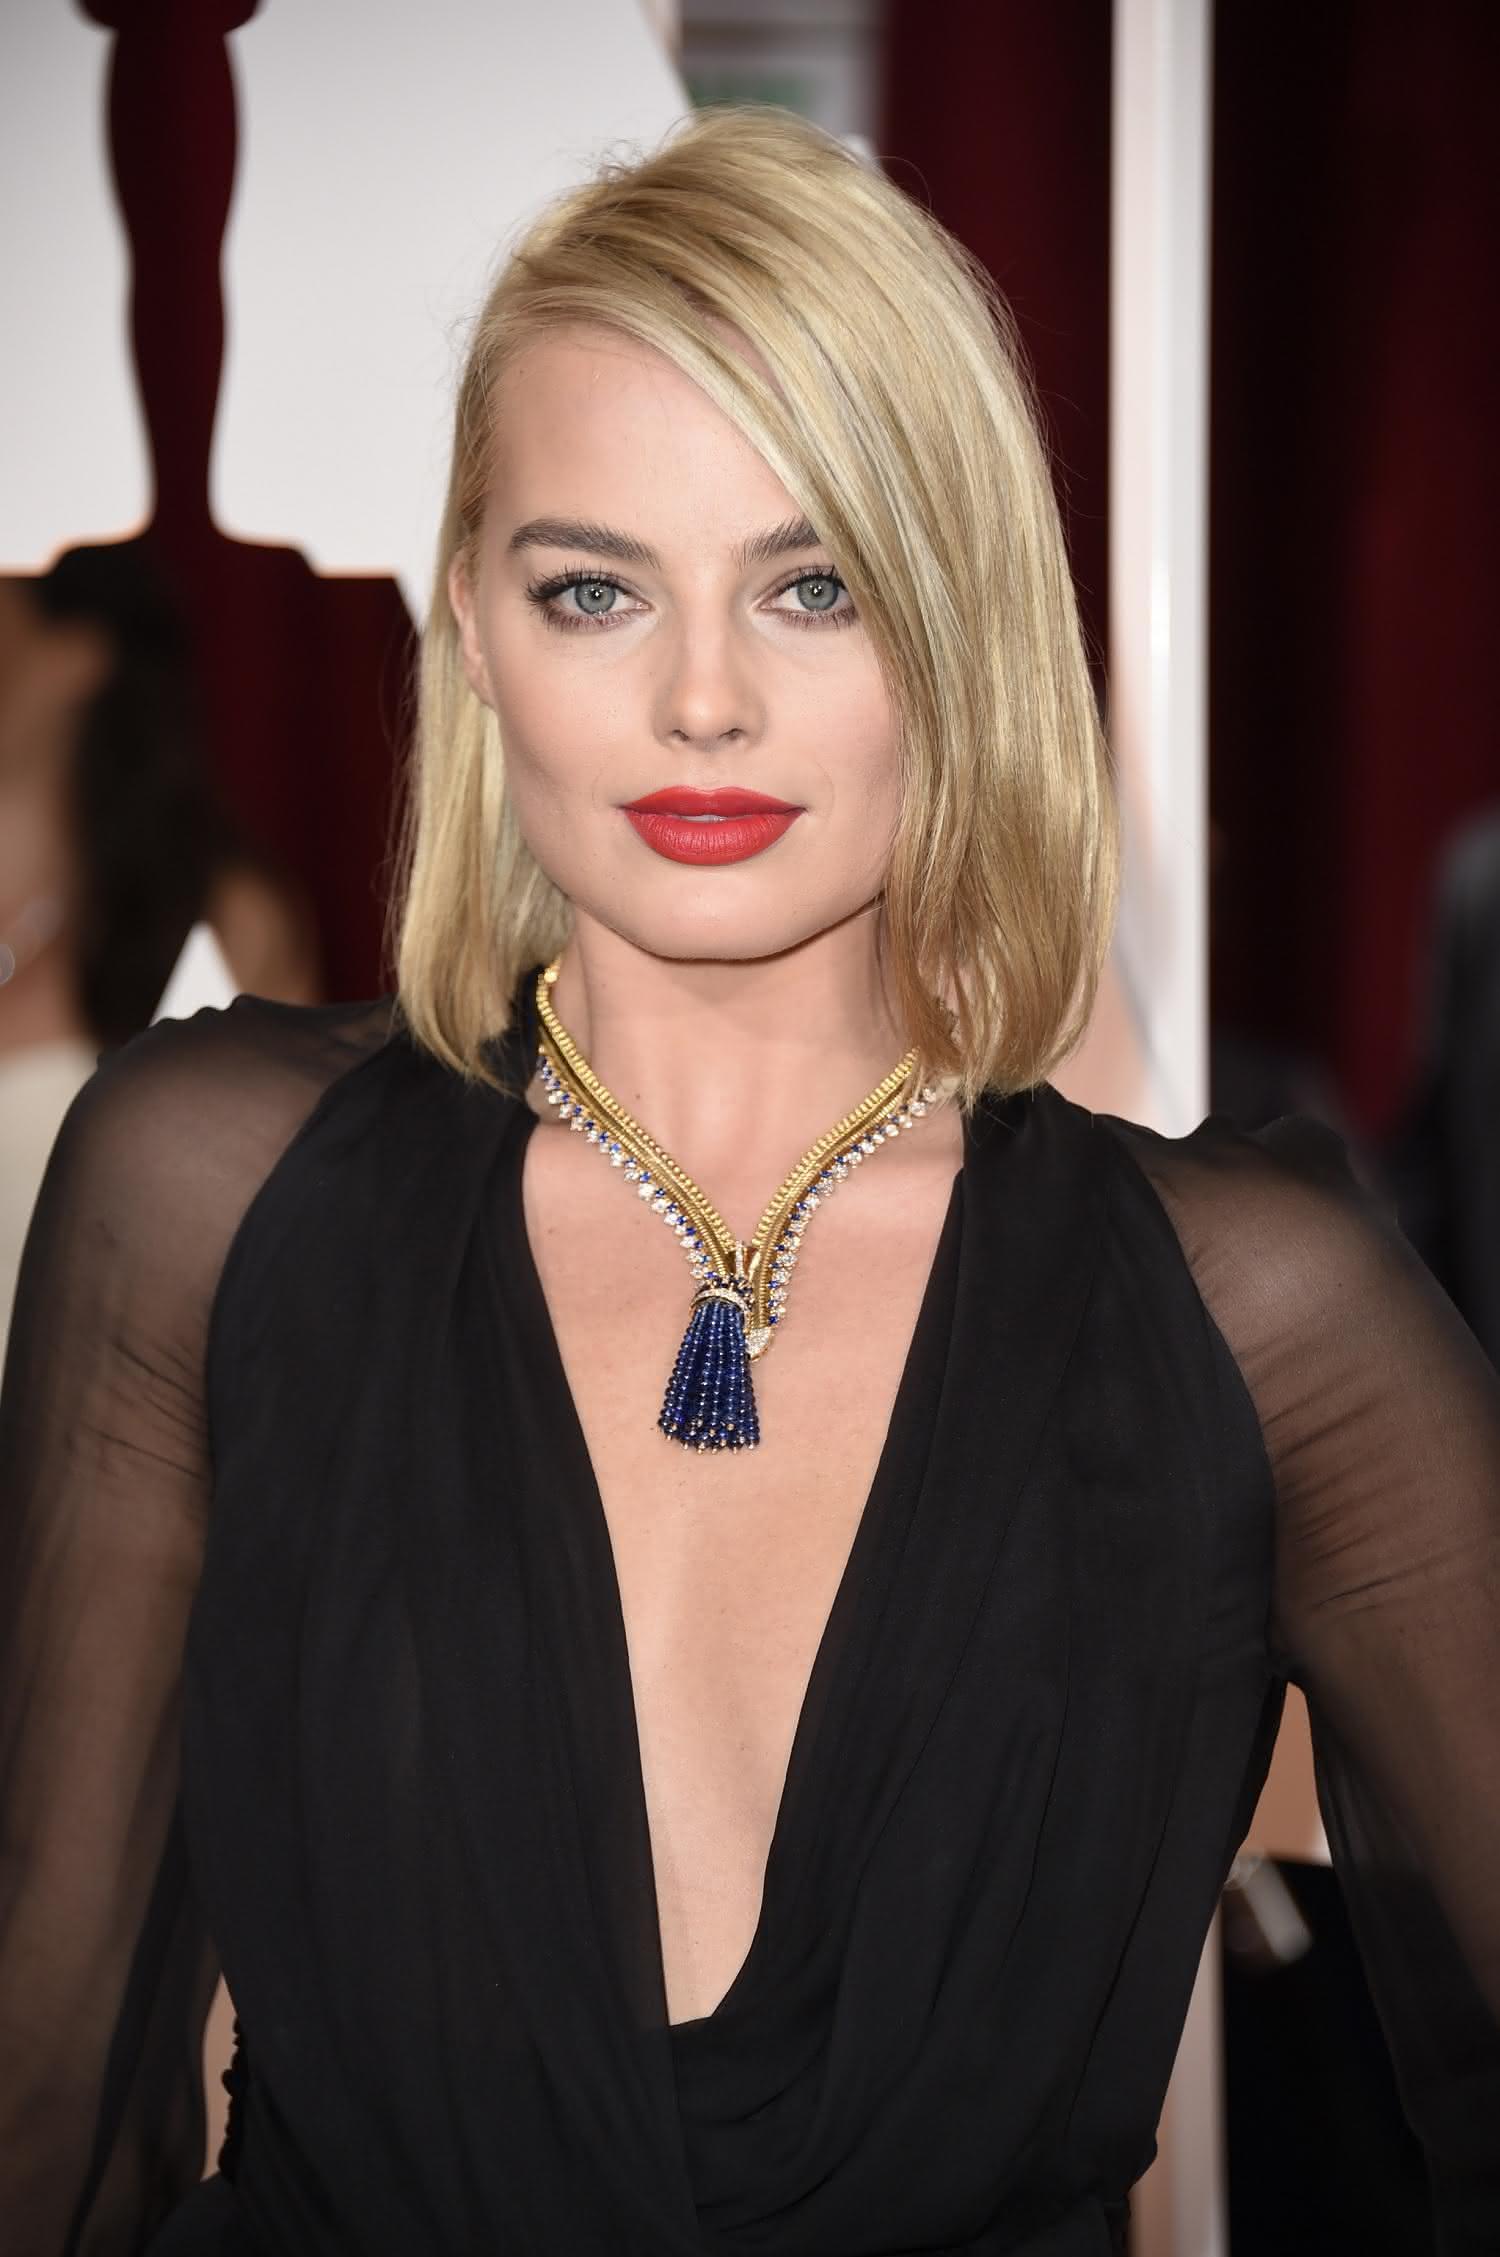 Margot-Robbie-rostoquadrado-cabelocurto